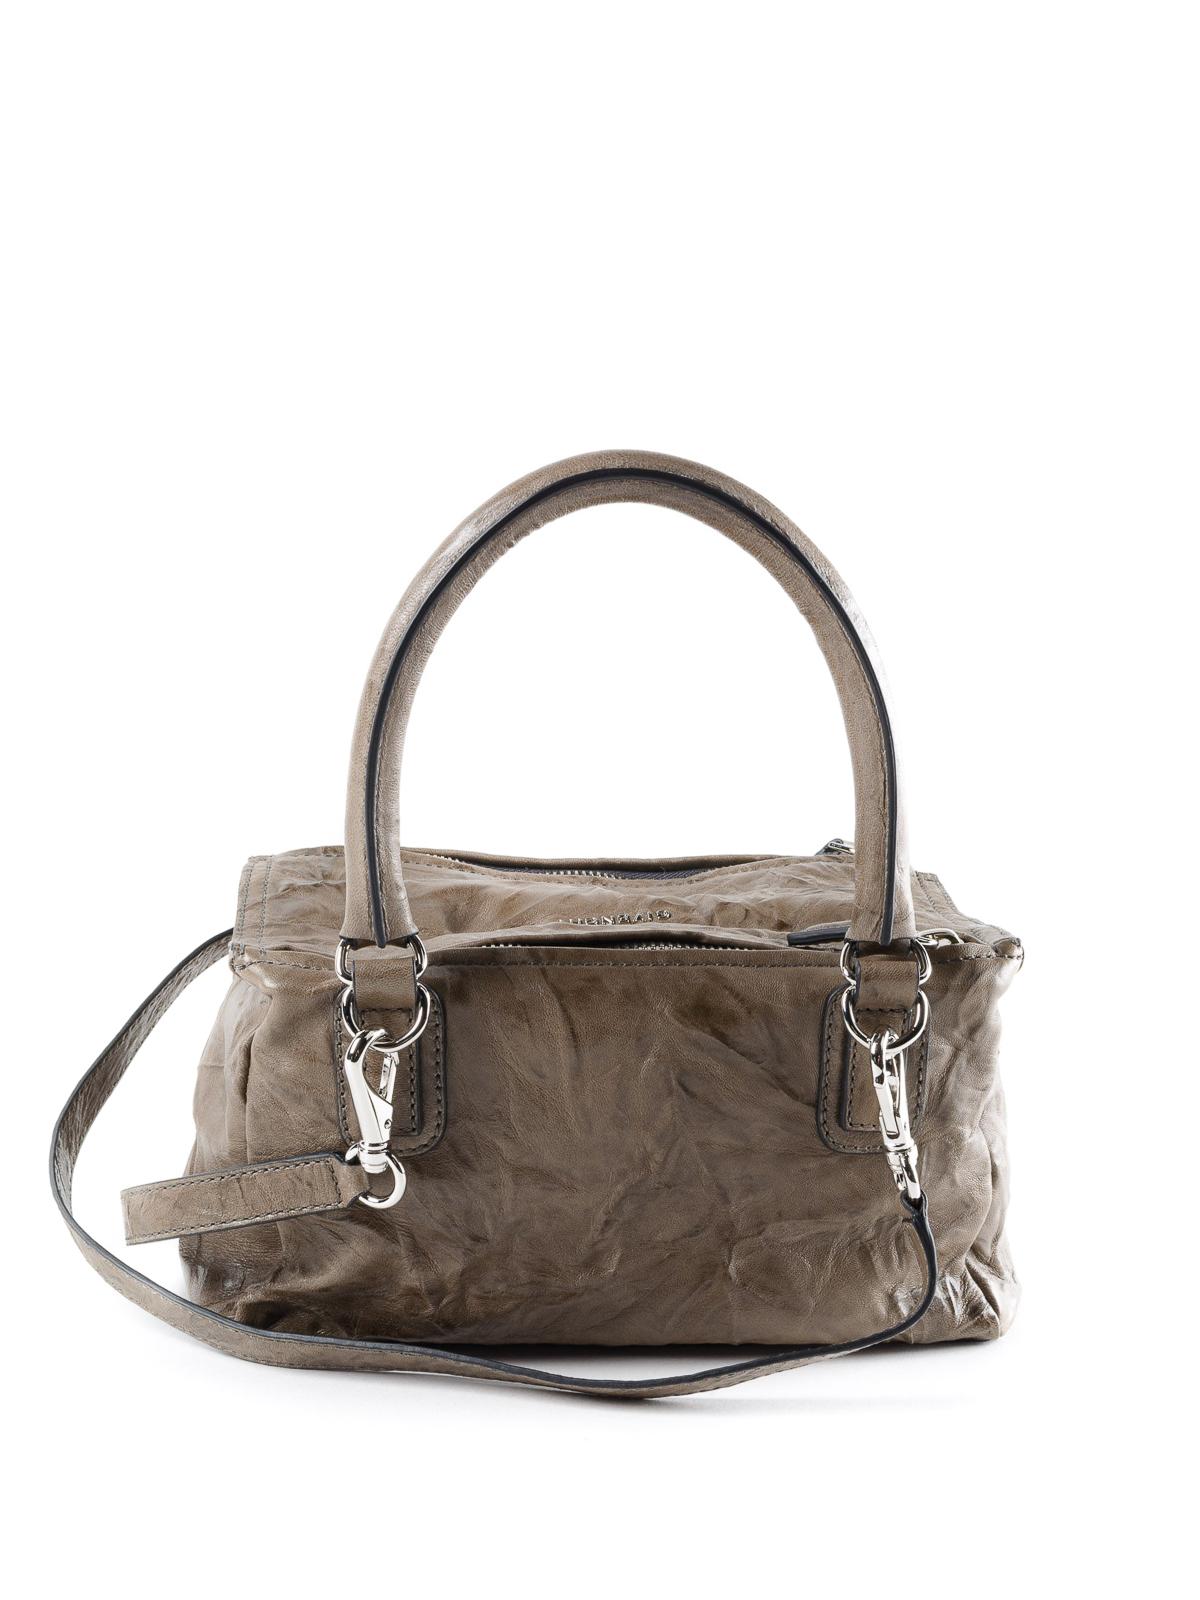 iKRIX GIVENCHY  shoulder bags - Small Pandora vintage leather bag dd57e049fc